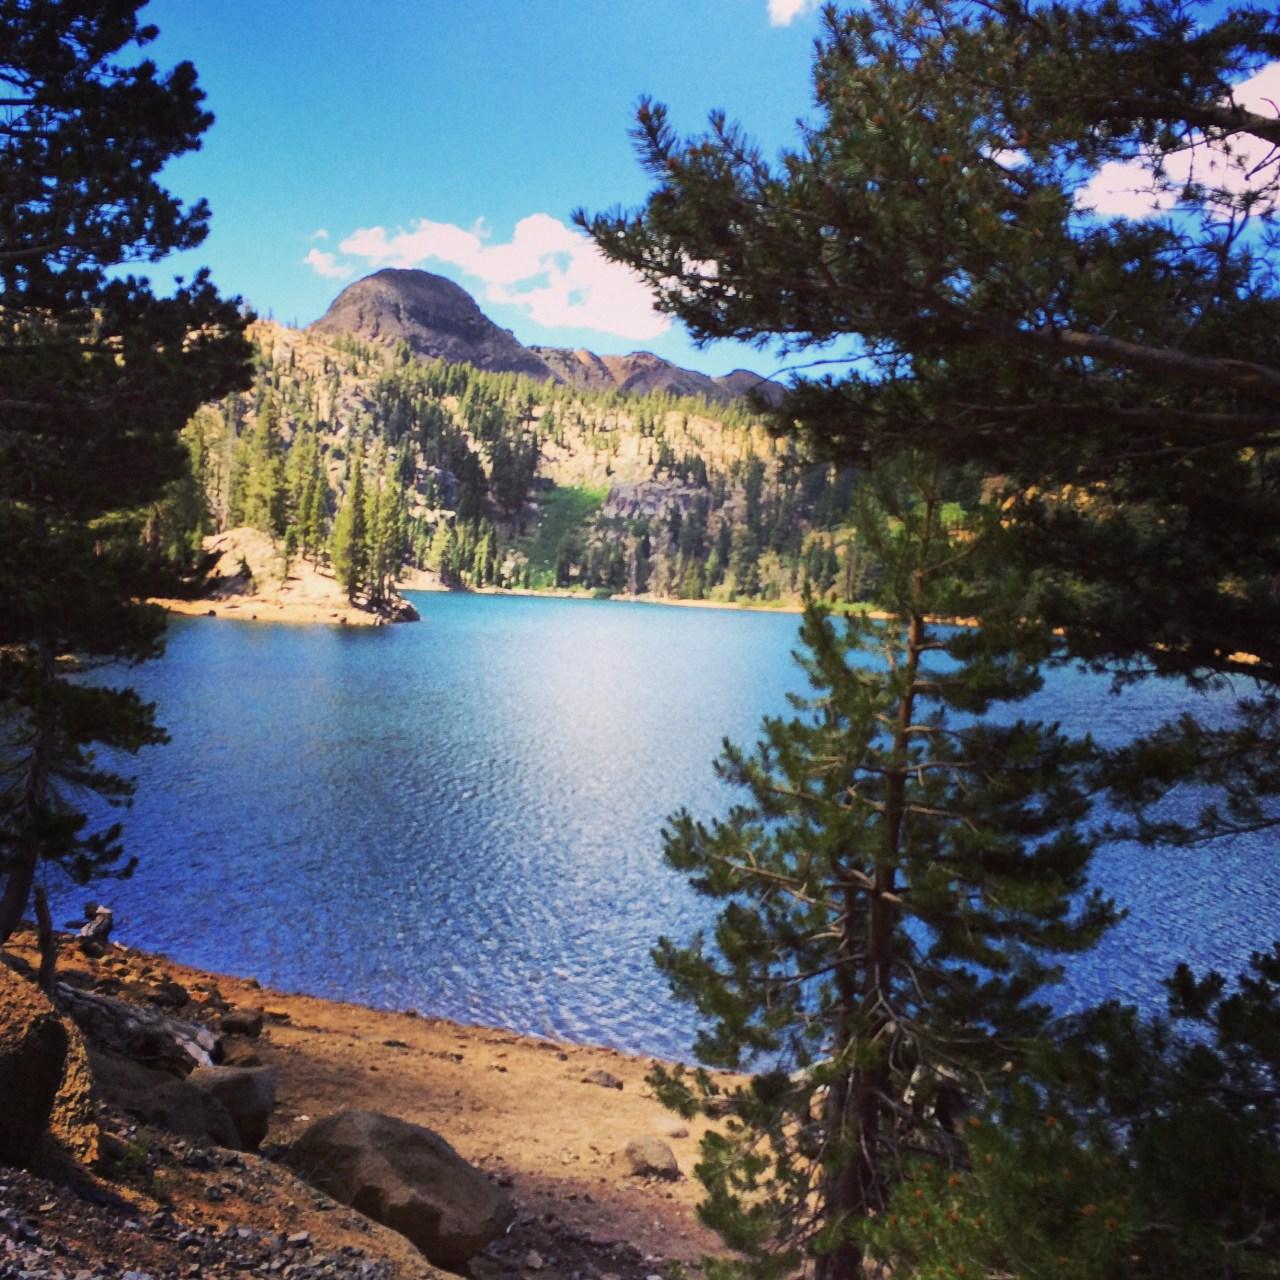 The lake on Ebbetts Pass climb. Looked very inviting.